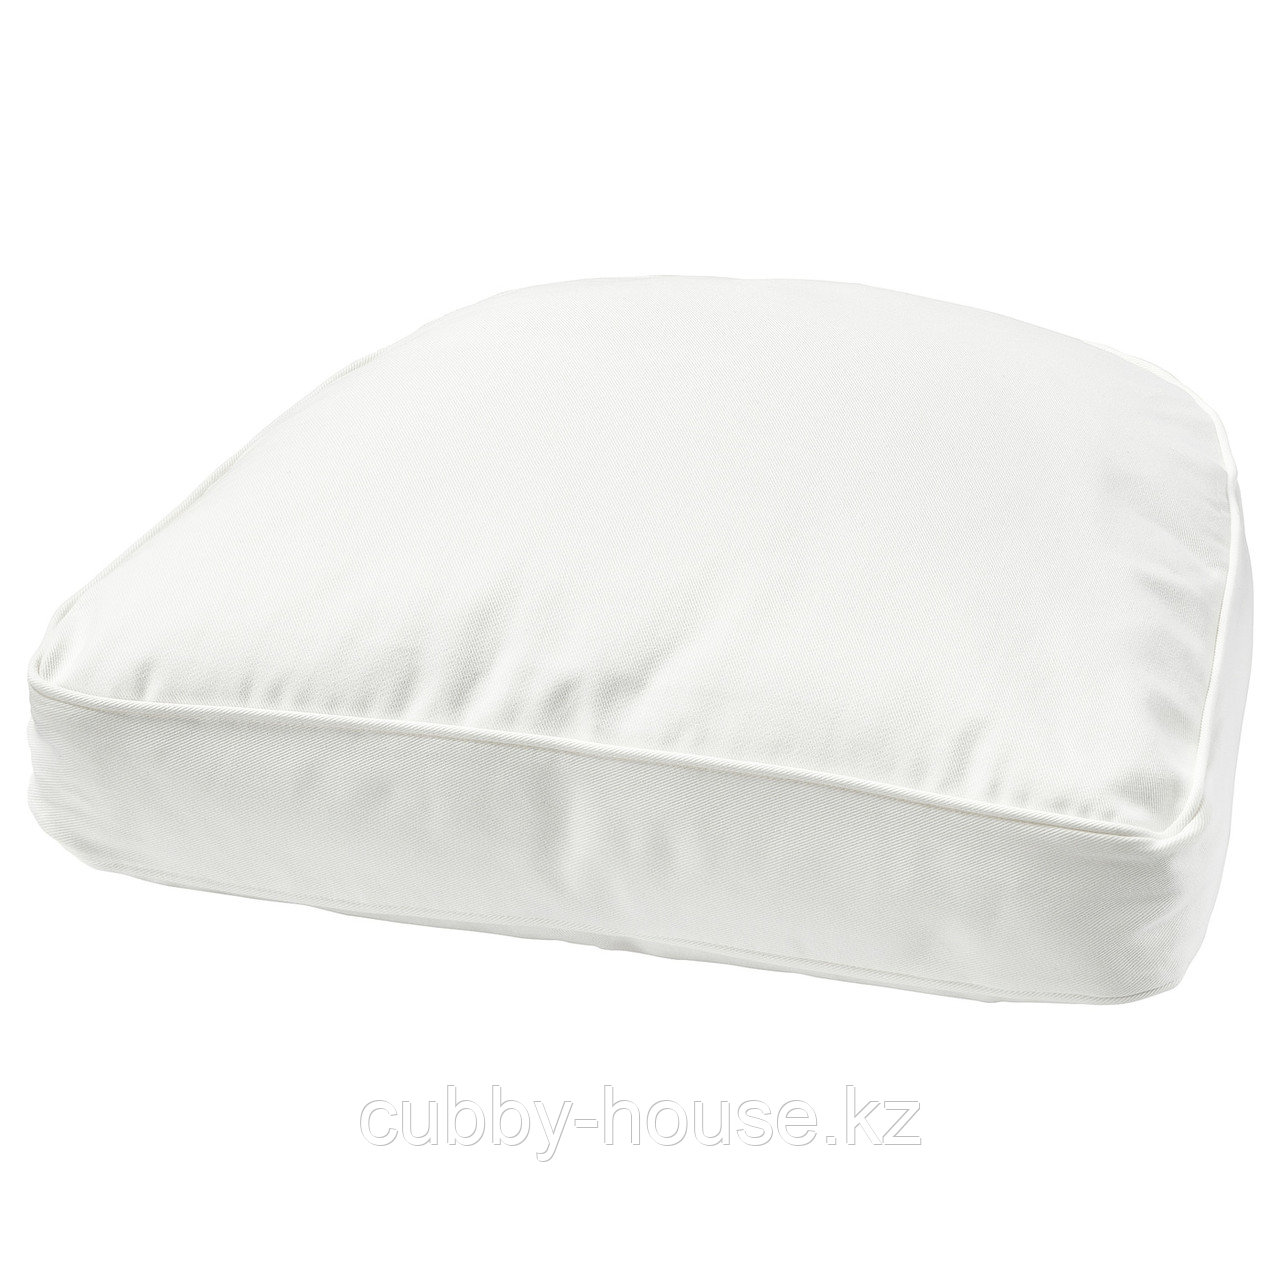 ЮПВИК Подушка, Блекинге белый, 54x54 см - фото 1